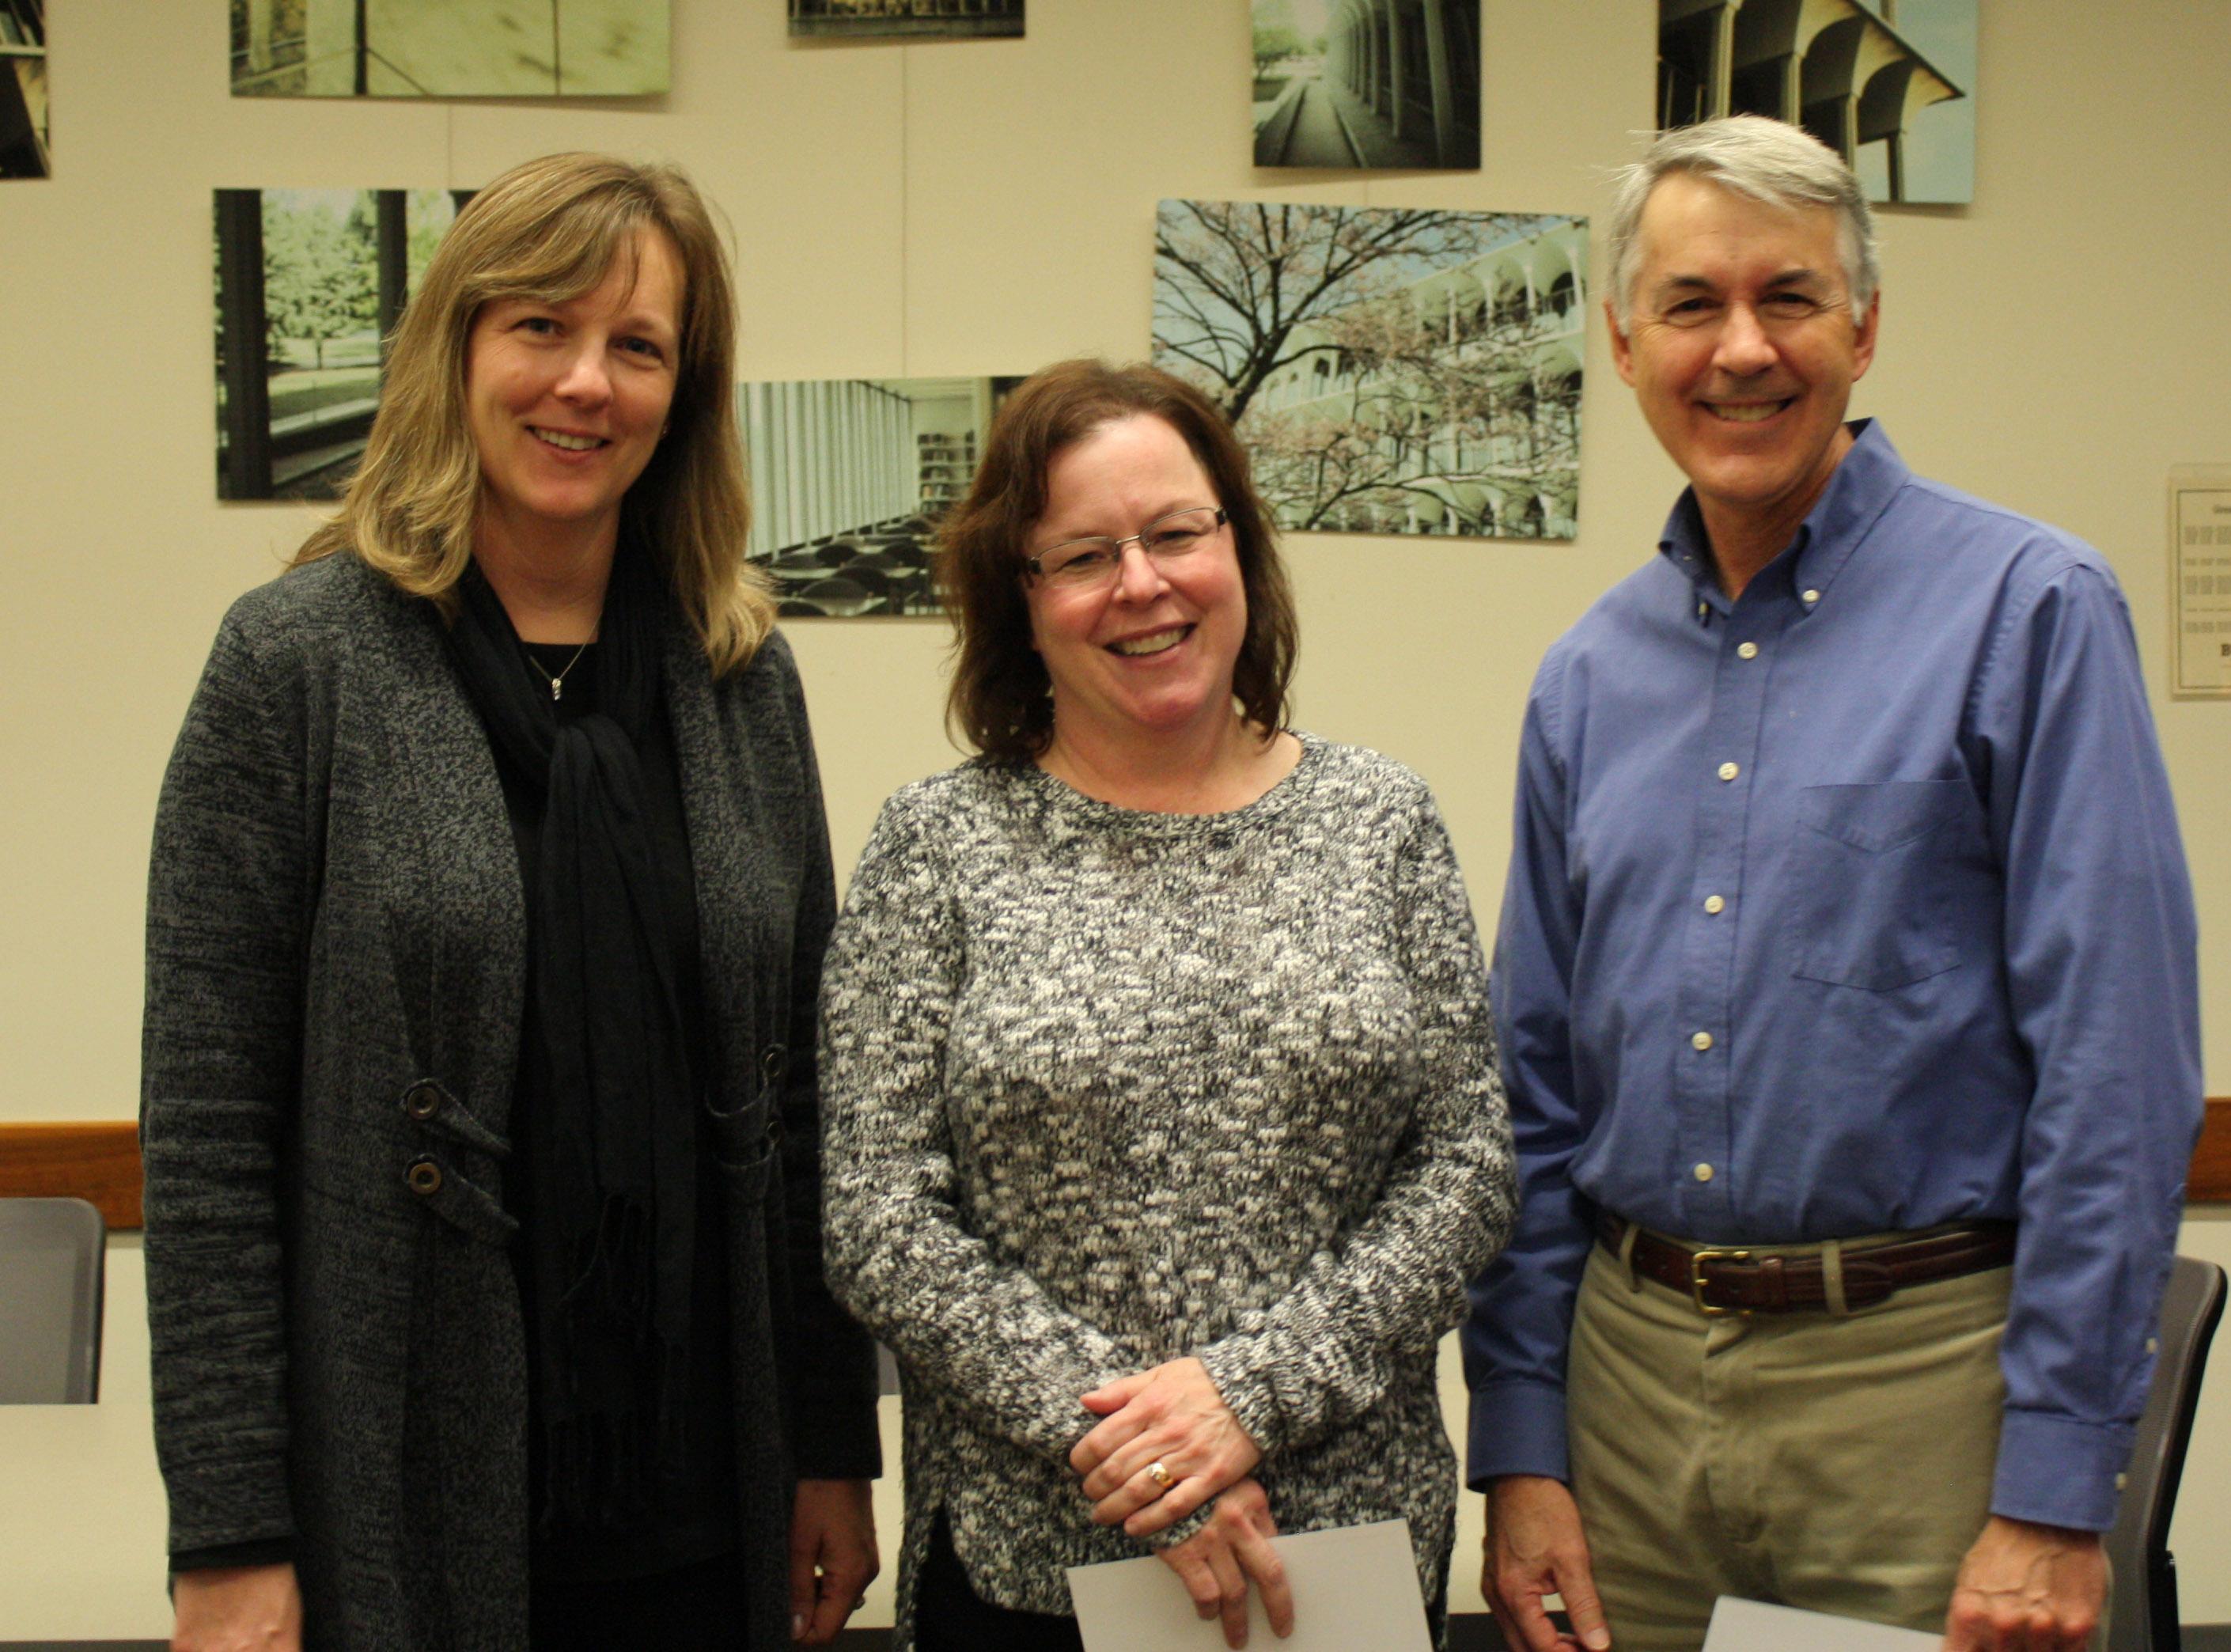 Celebration Certificate Recipients - LSB faculty